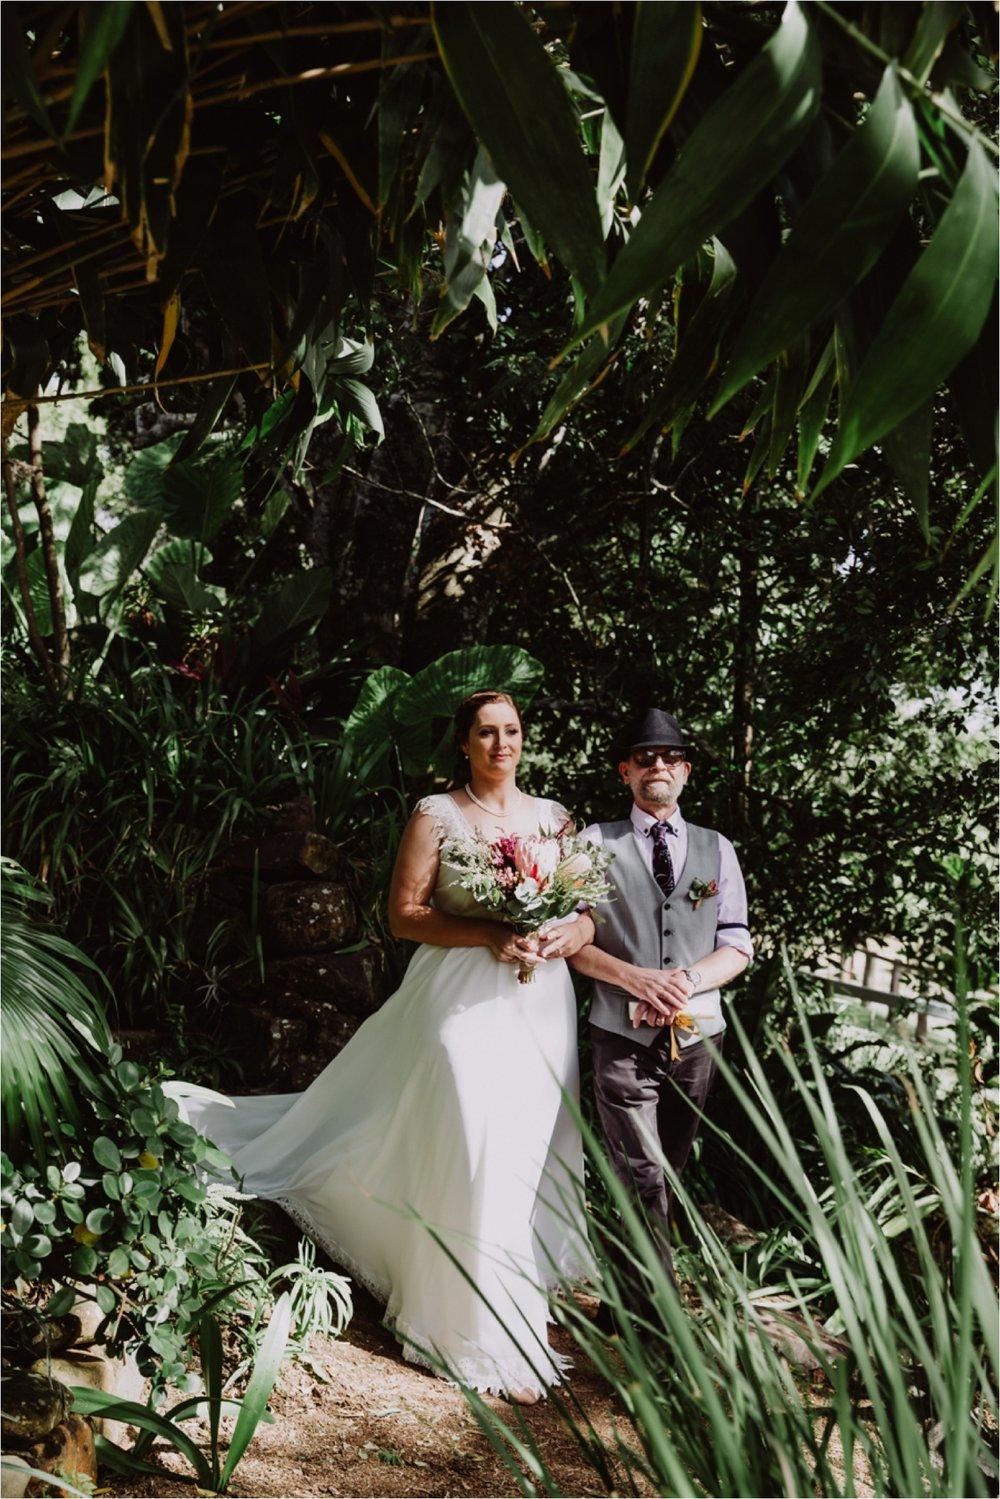 Gold Coast Wedding Photography - Riverwood Wedding_0031.jpg